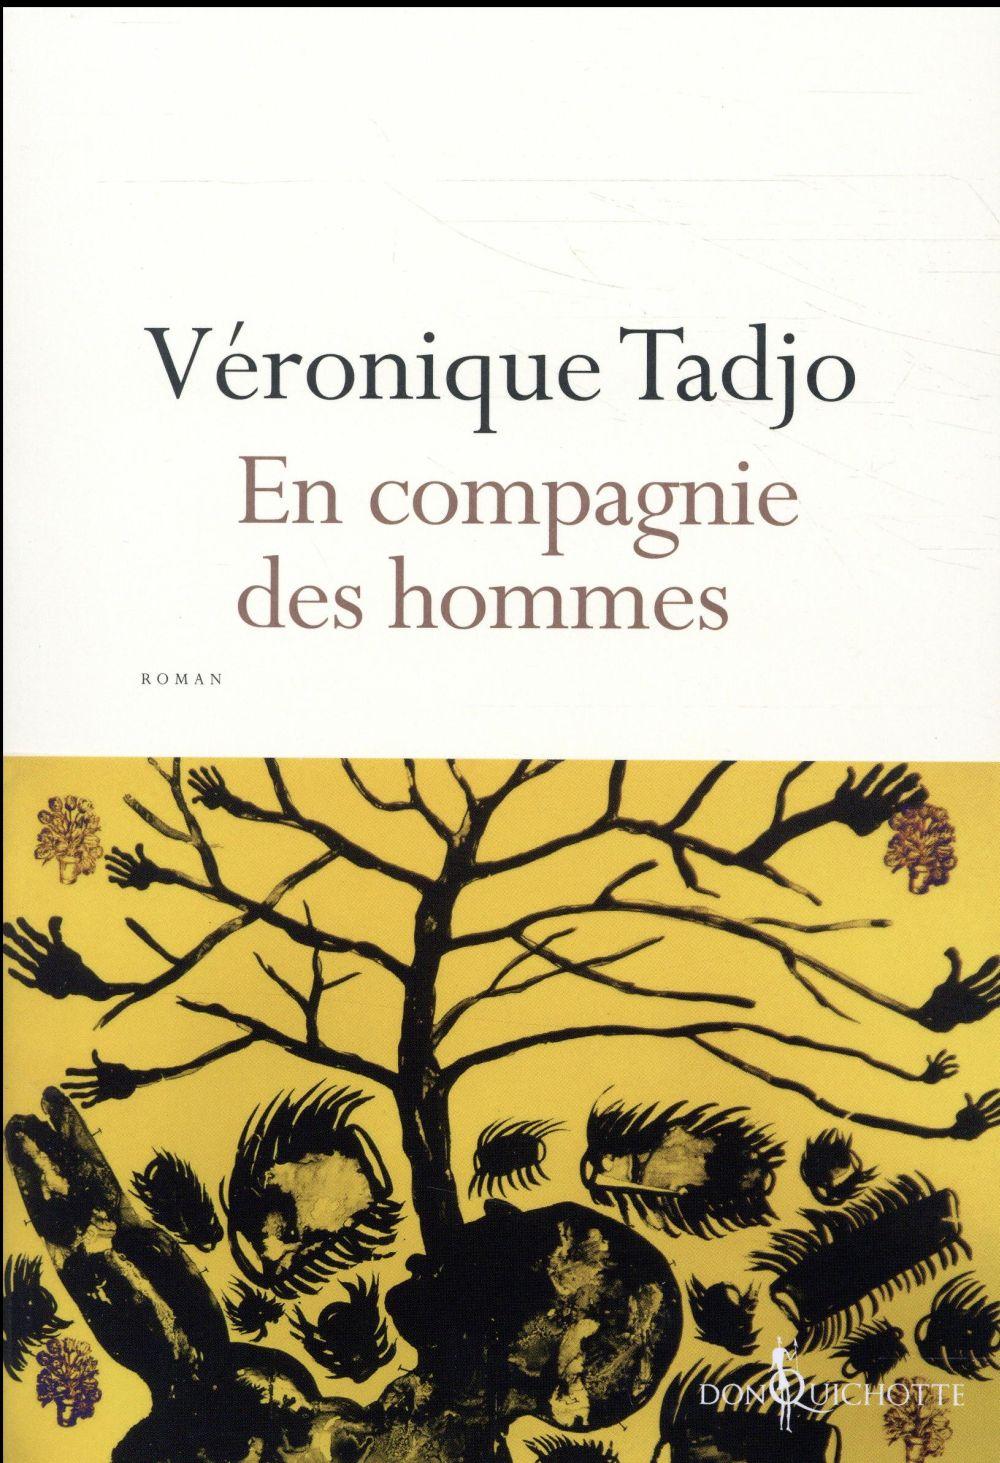 EN COMPAGNIE DES HOMMES